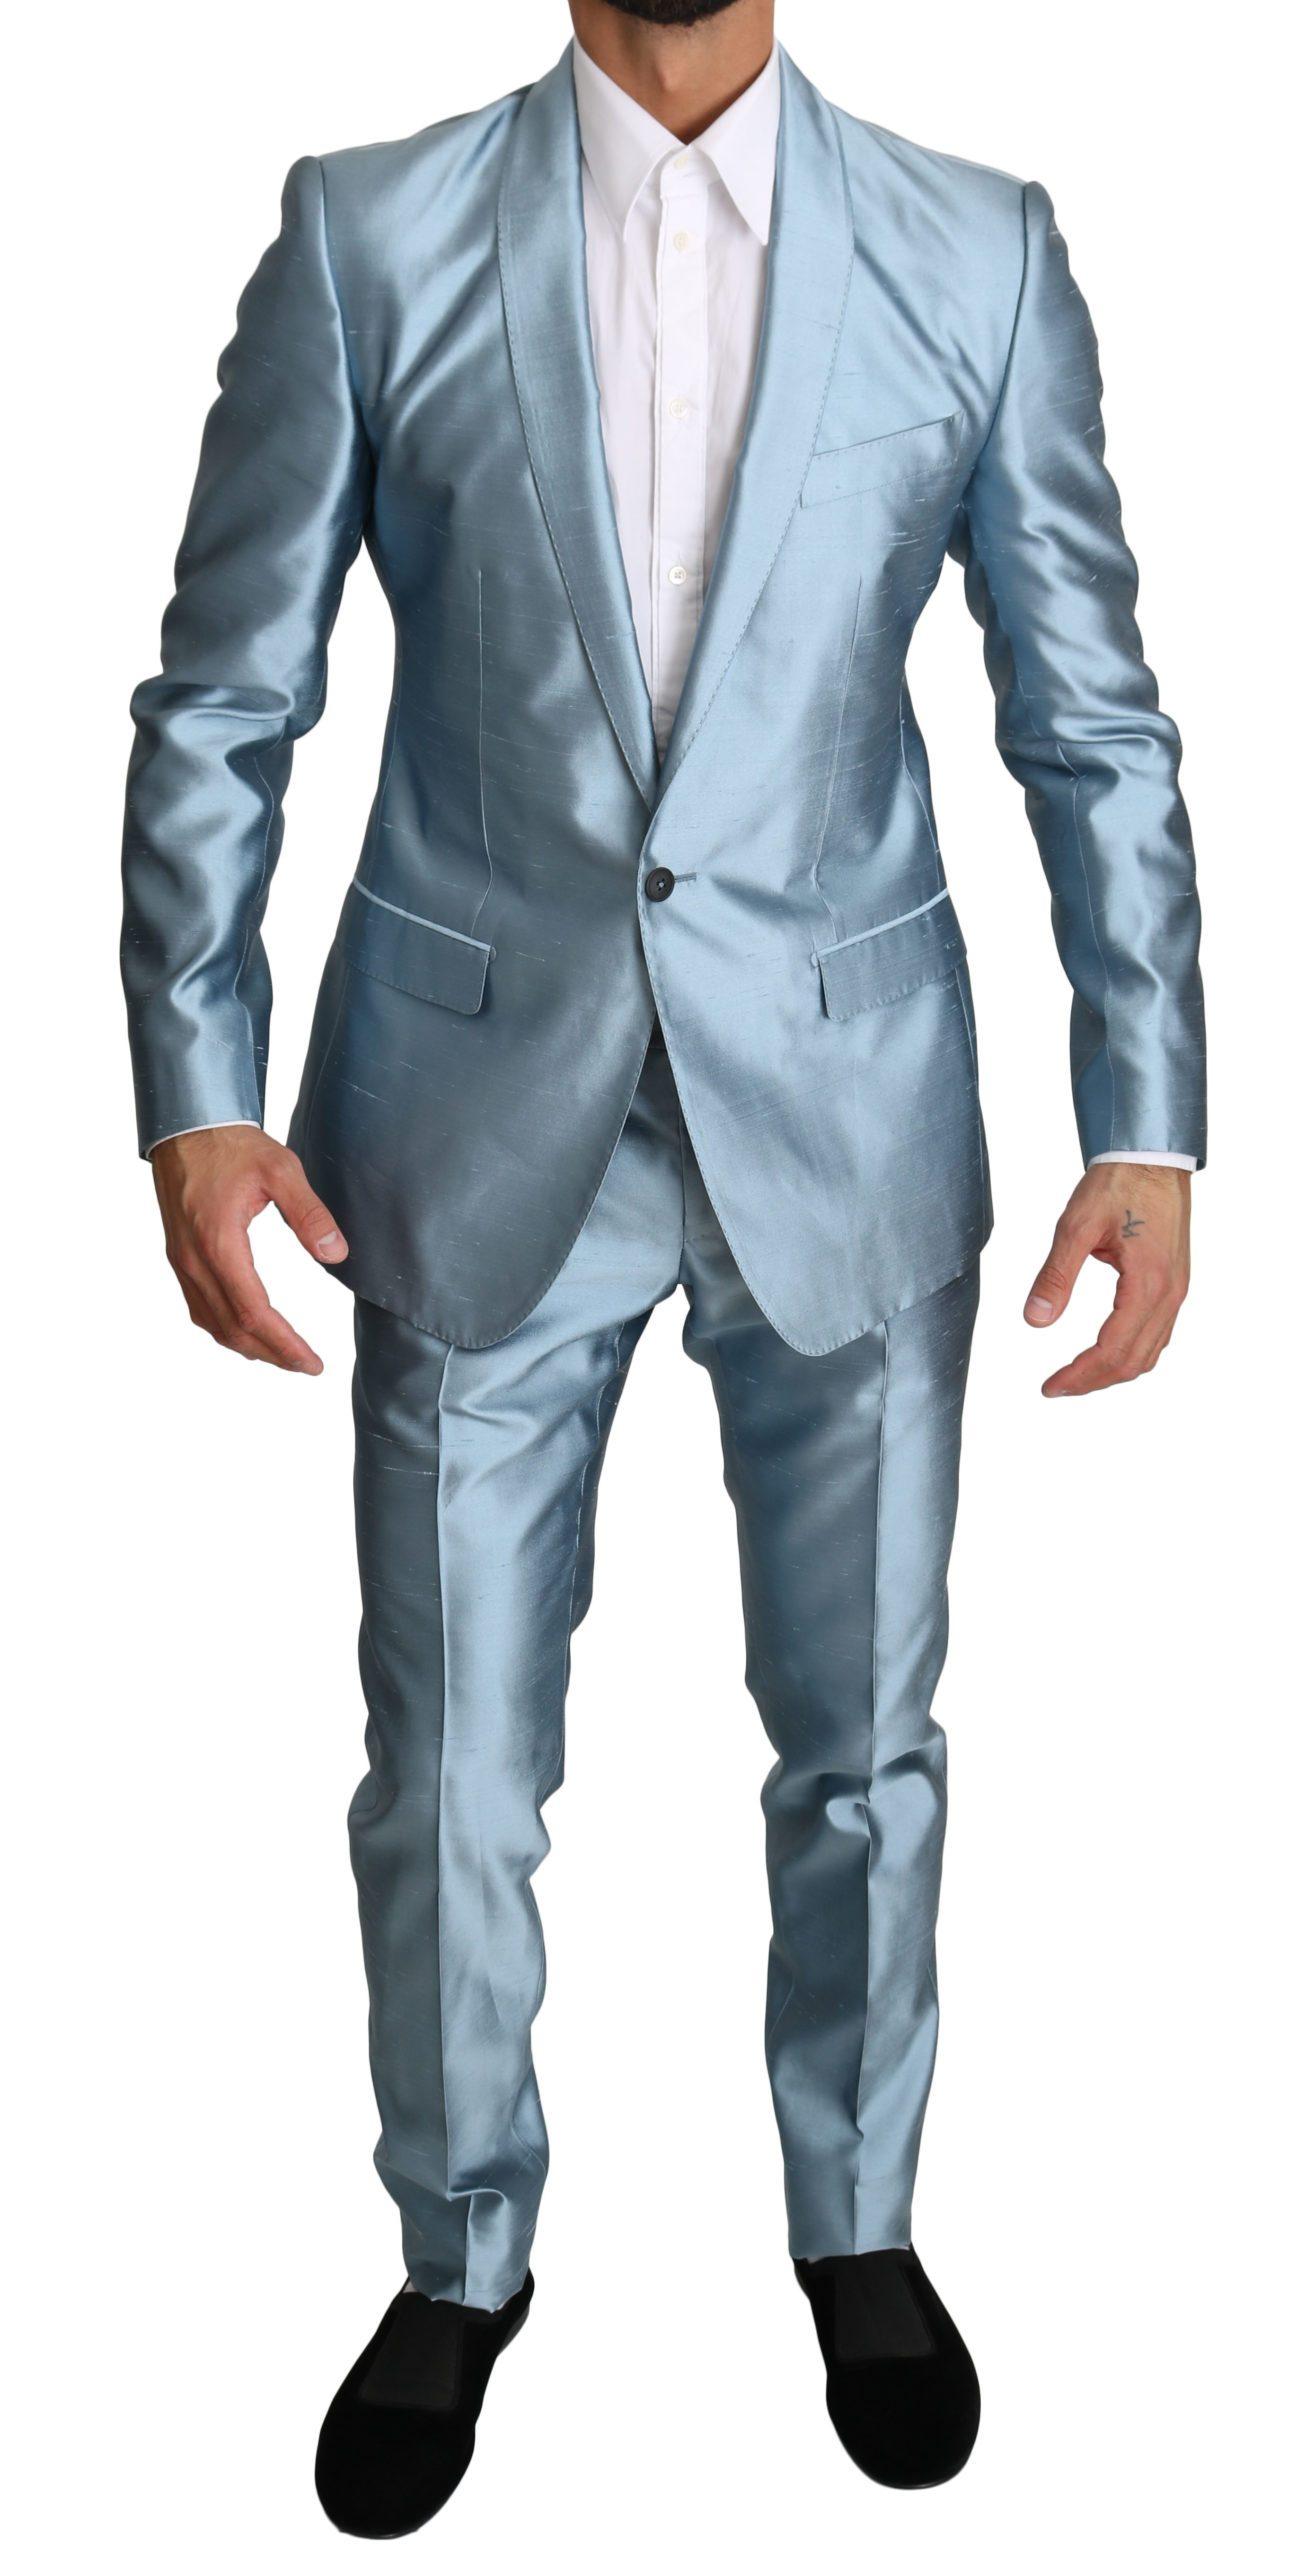 Dolce & Gabbana Men's Metallic 2 Piece MARTINI Suit Gray Light-blue KOS1553 - IT54   XL